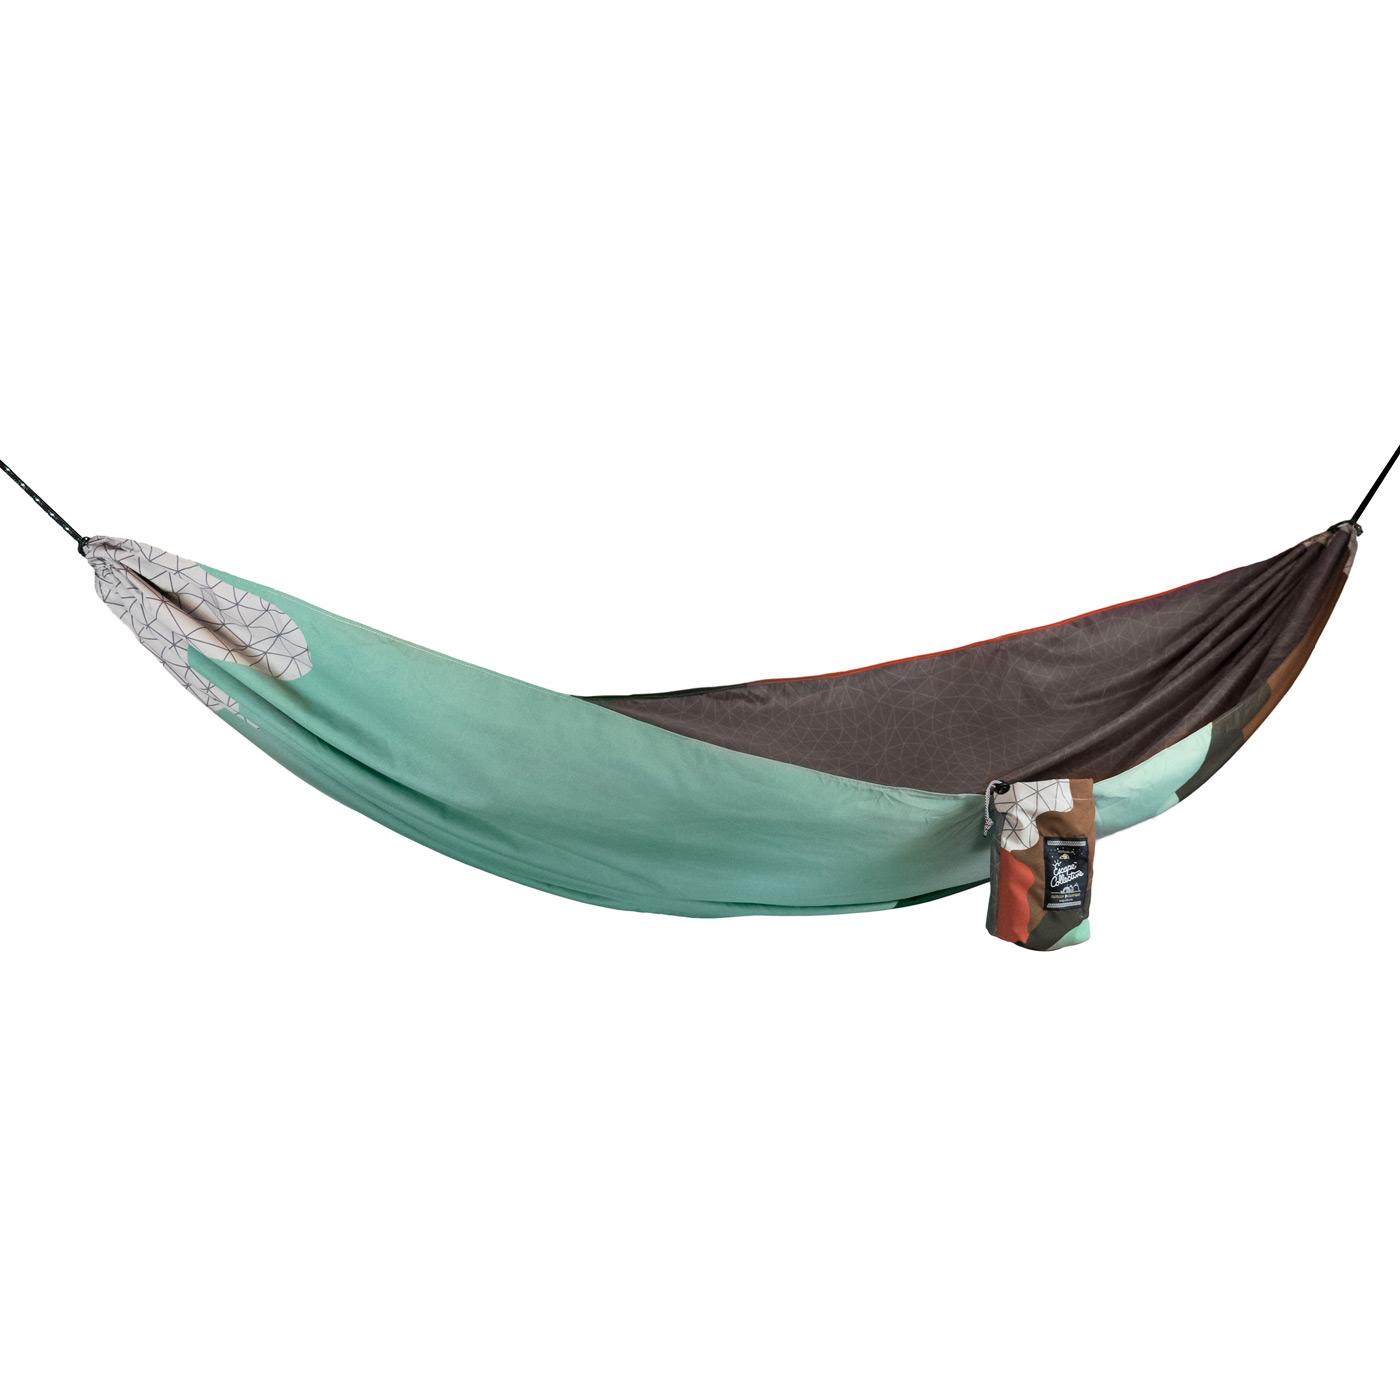 travel hammocks charcoal castaway nylon beach pa blue image hammock single xx